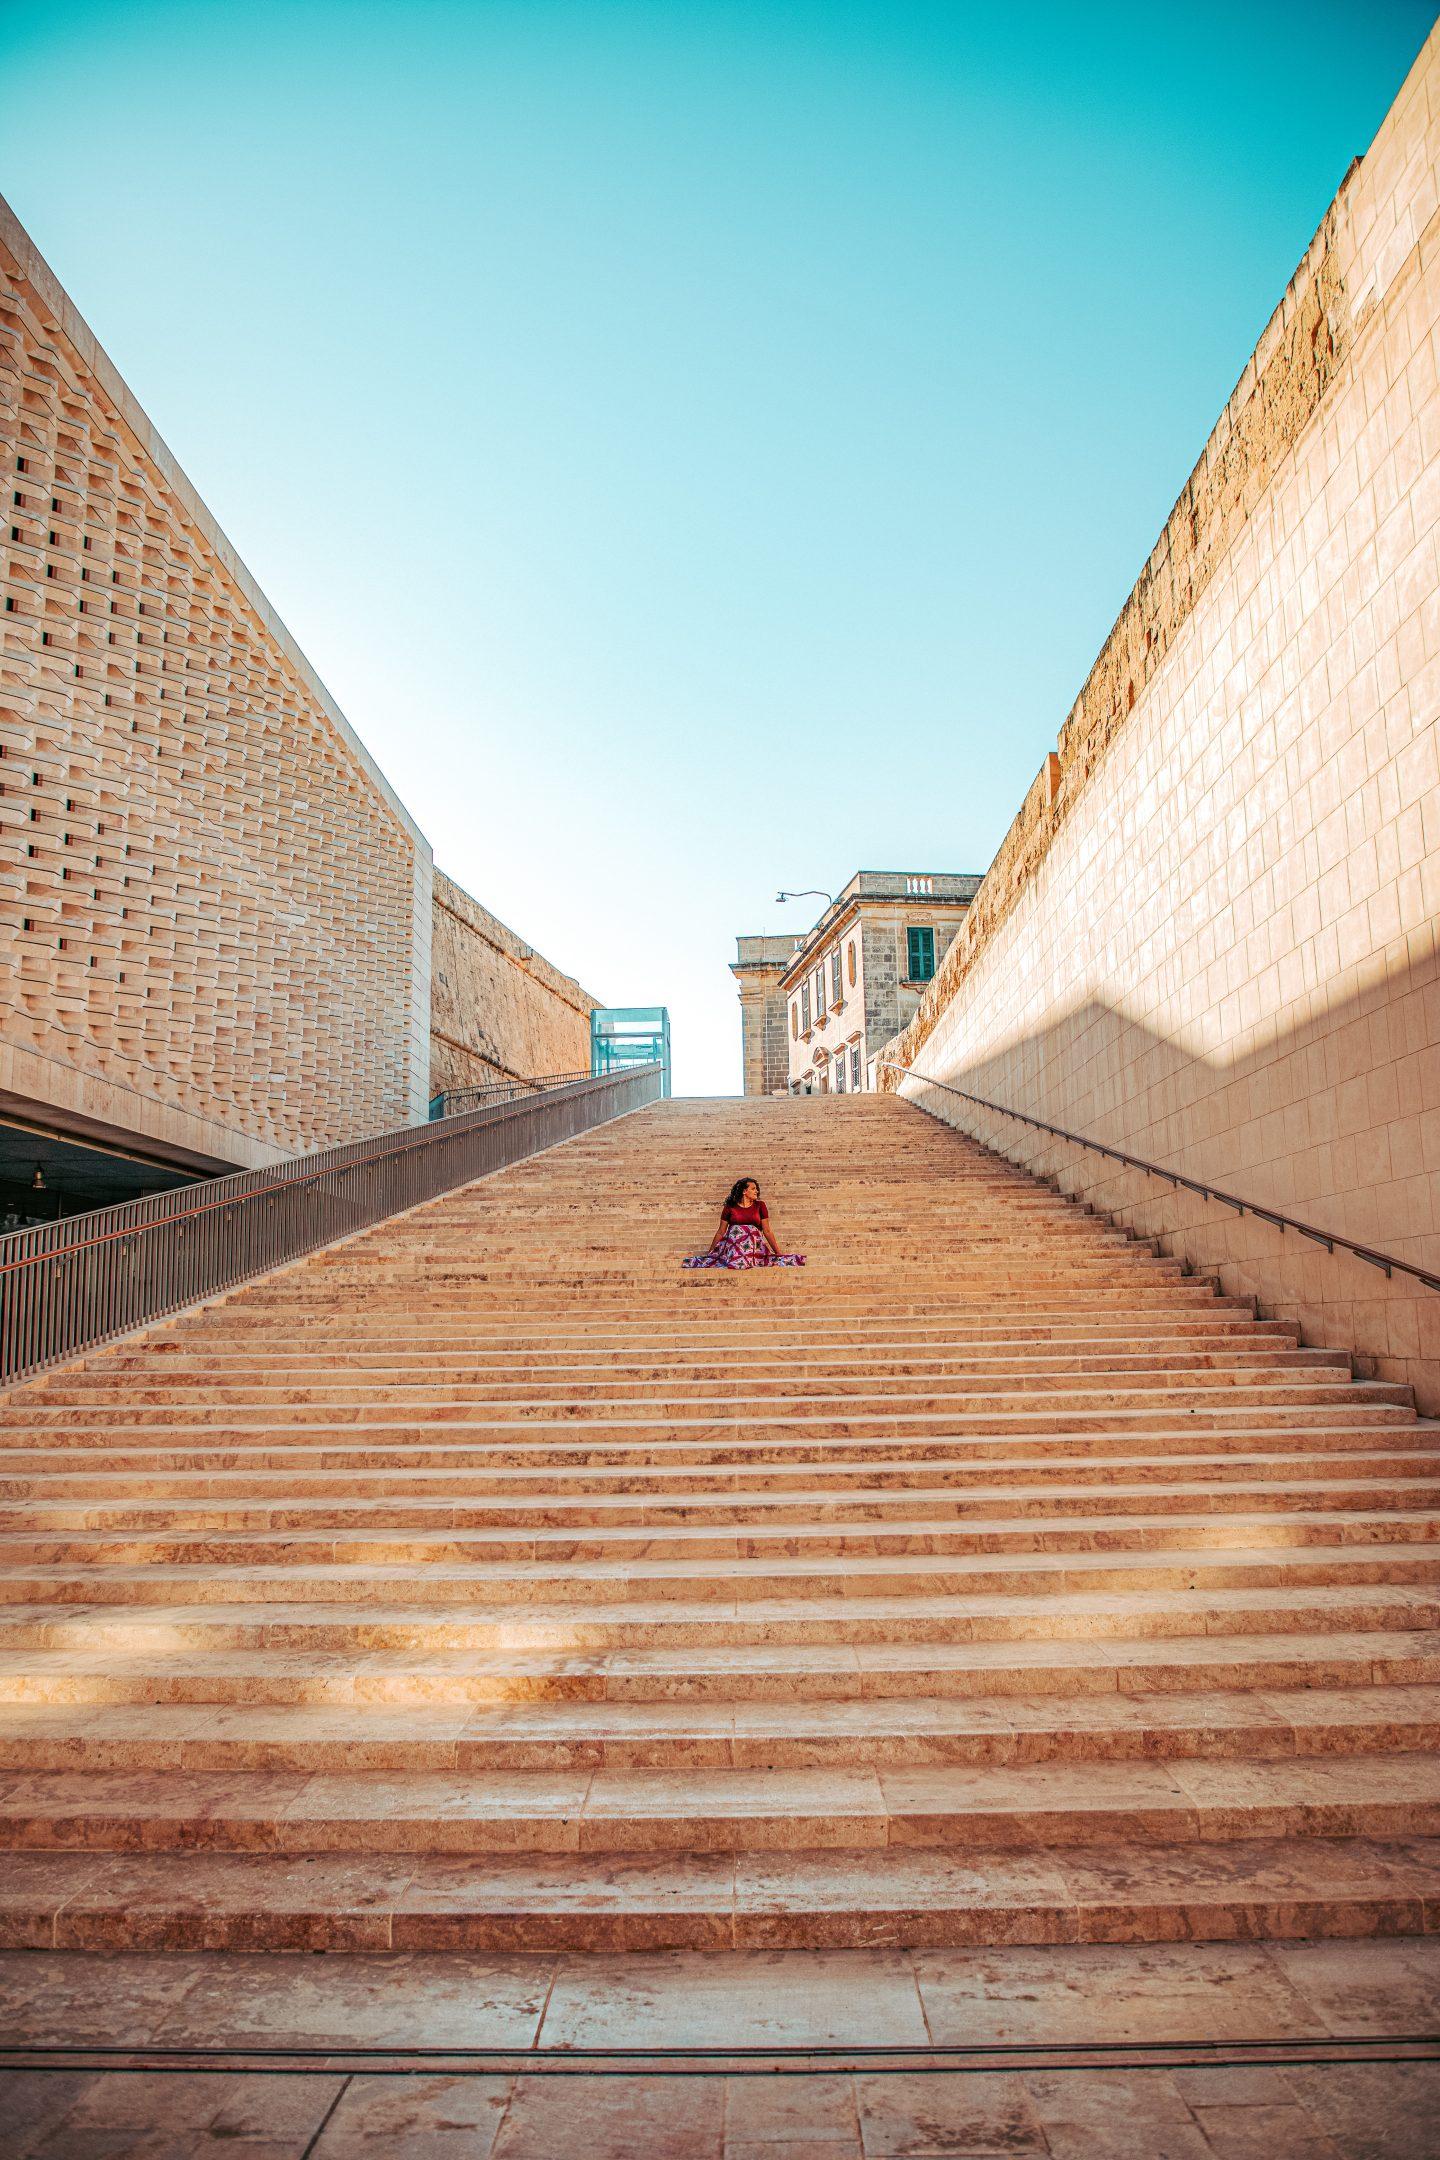 malta-valletta-parliament-instagram-best-spots